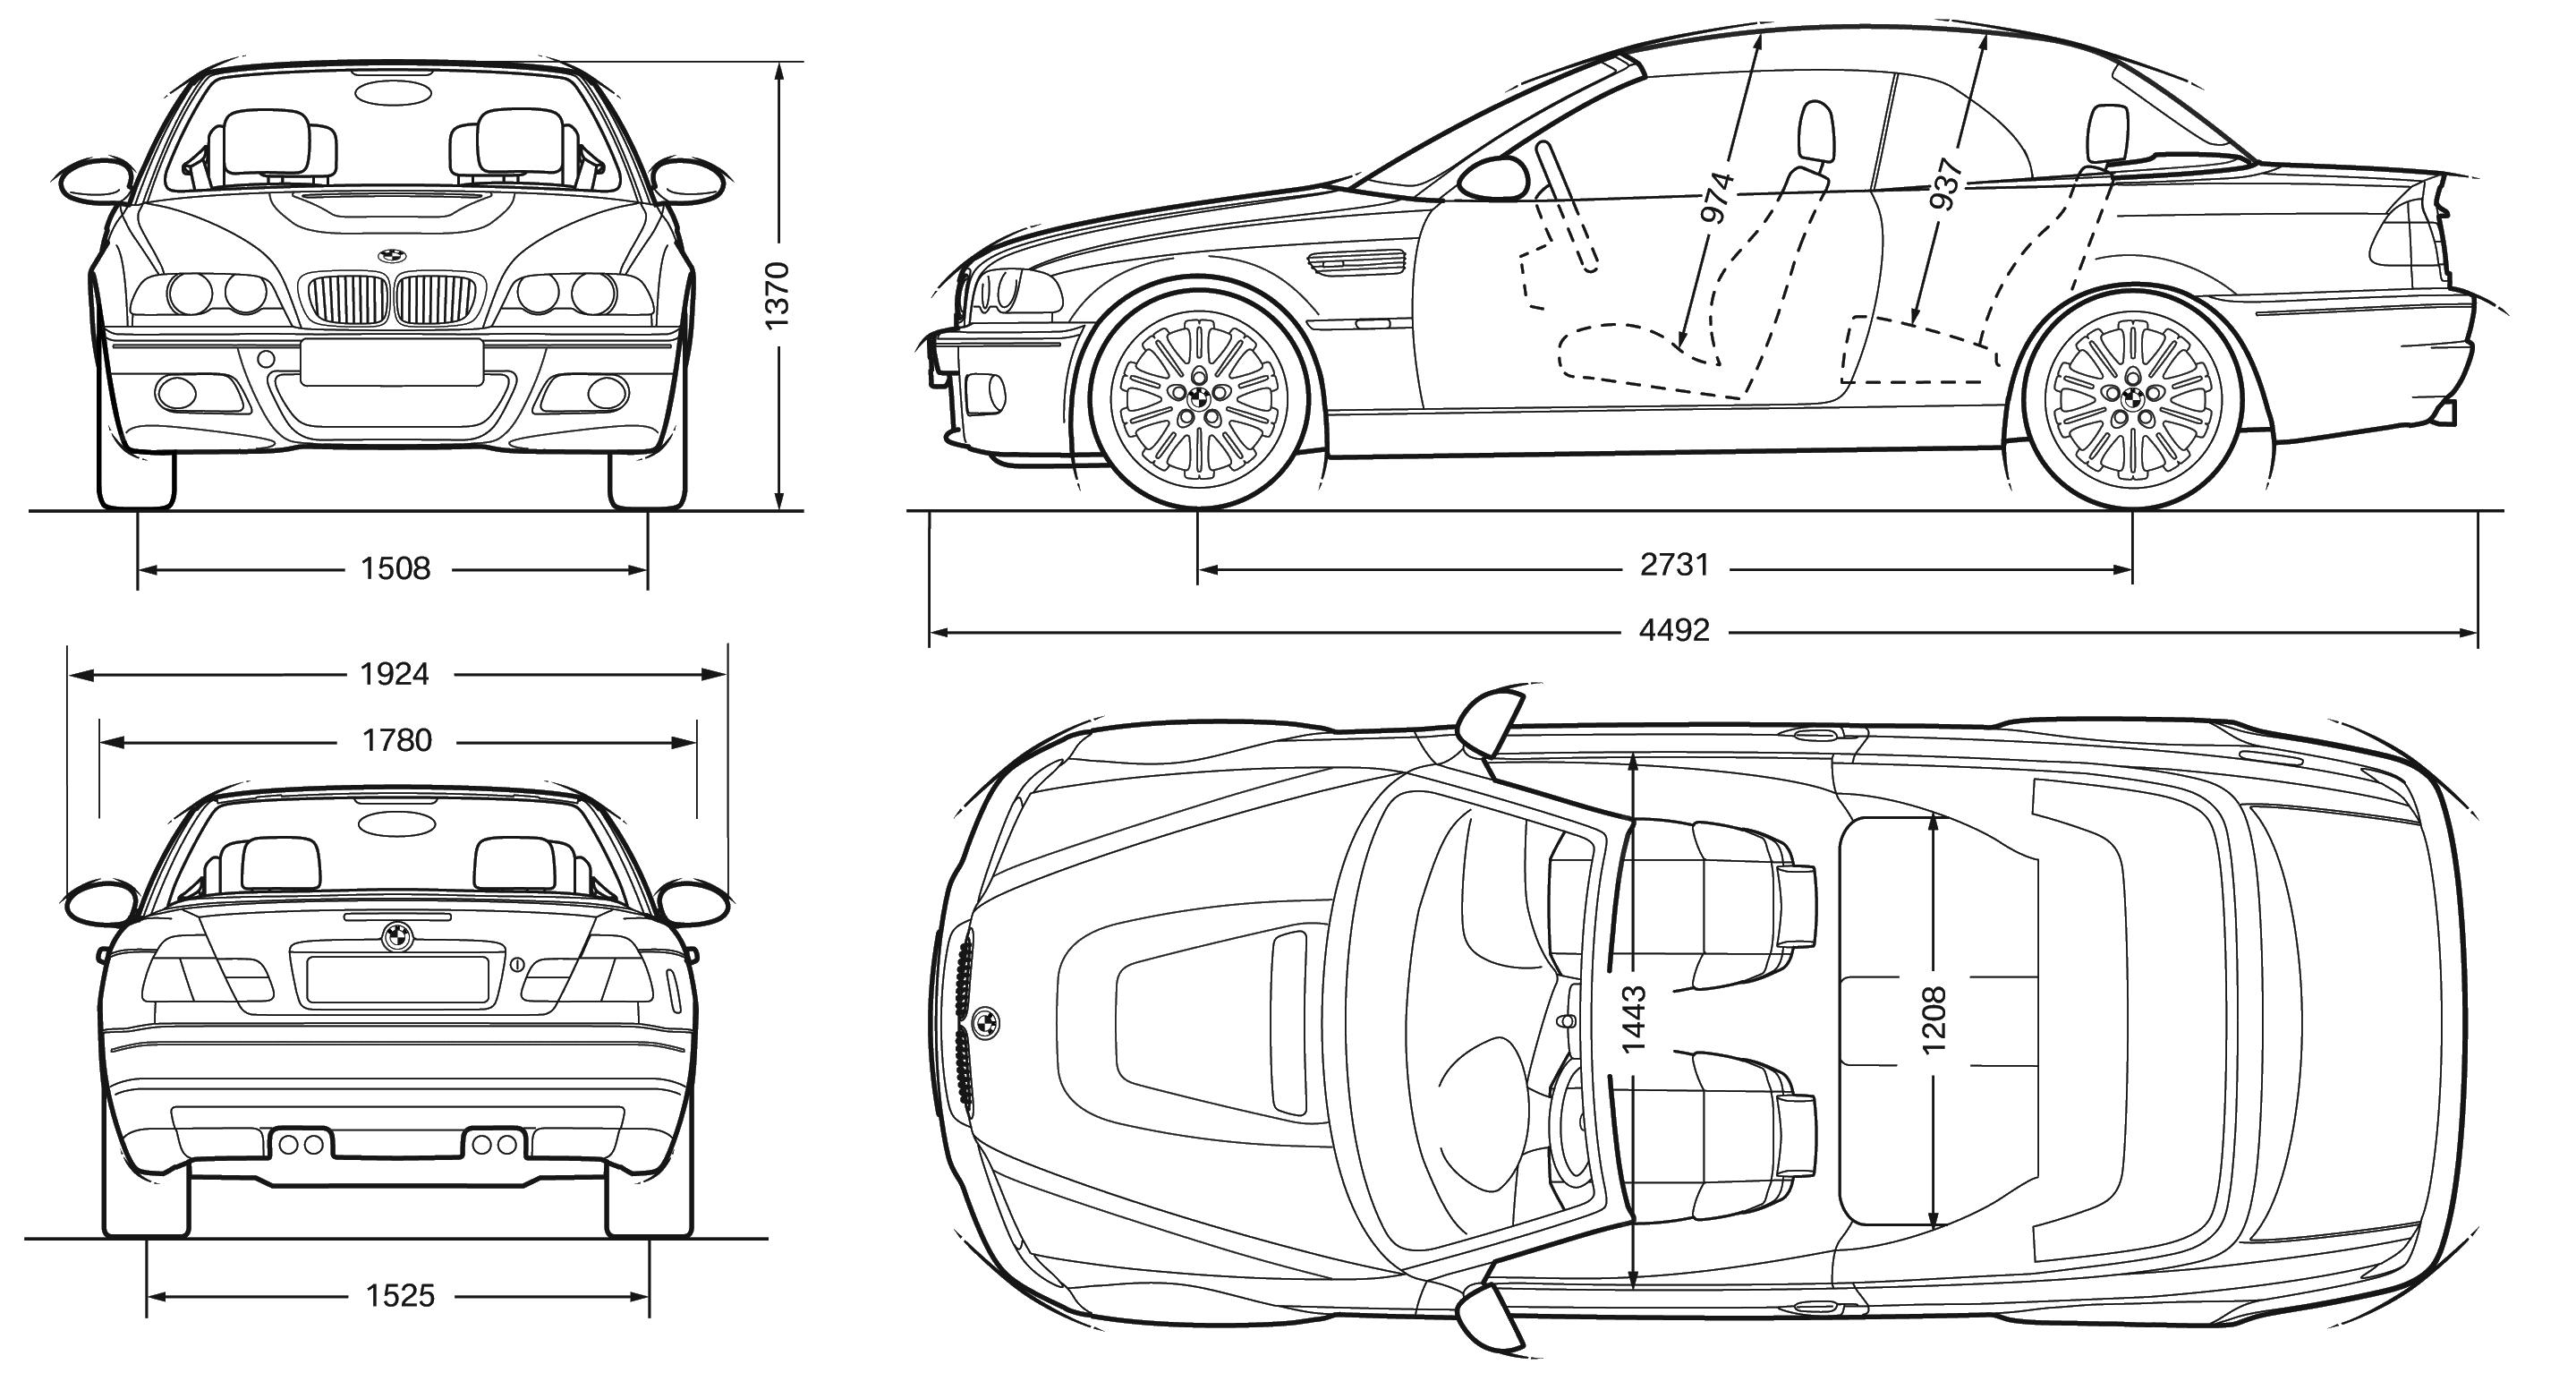 bmw E46 blueprint